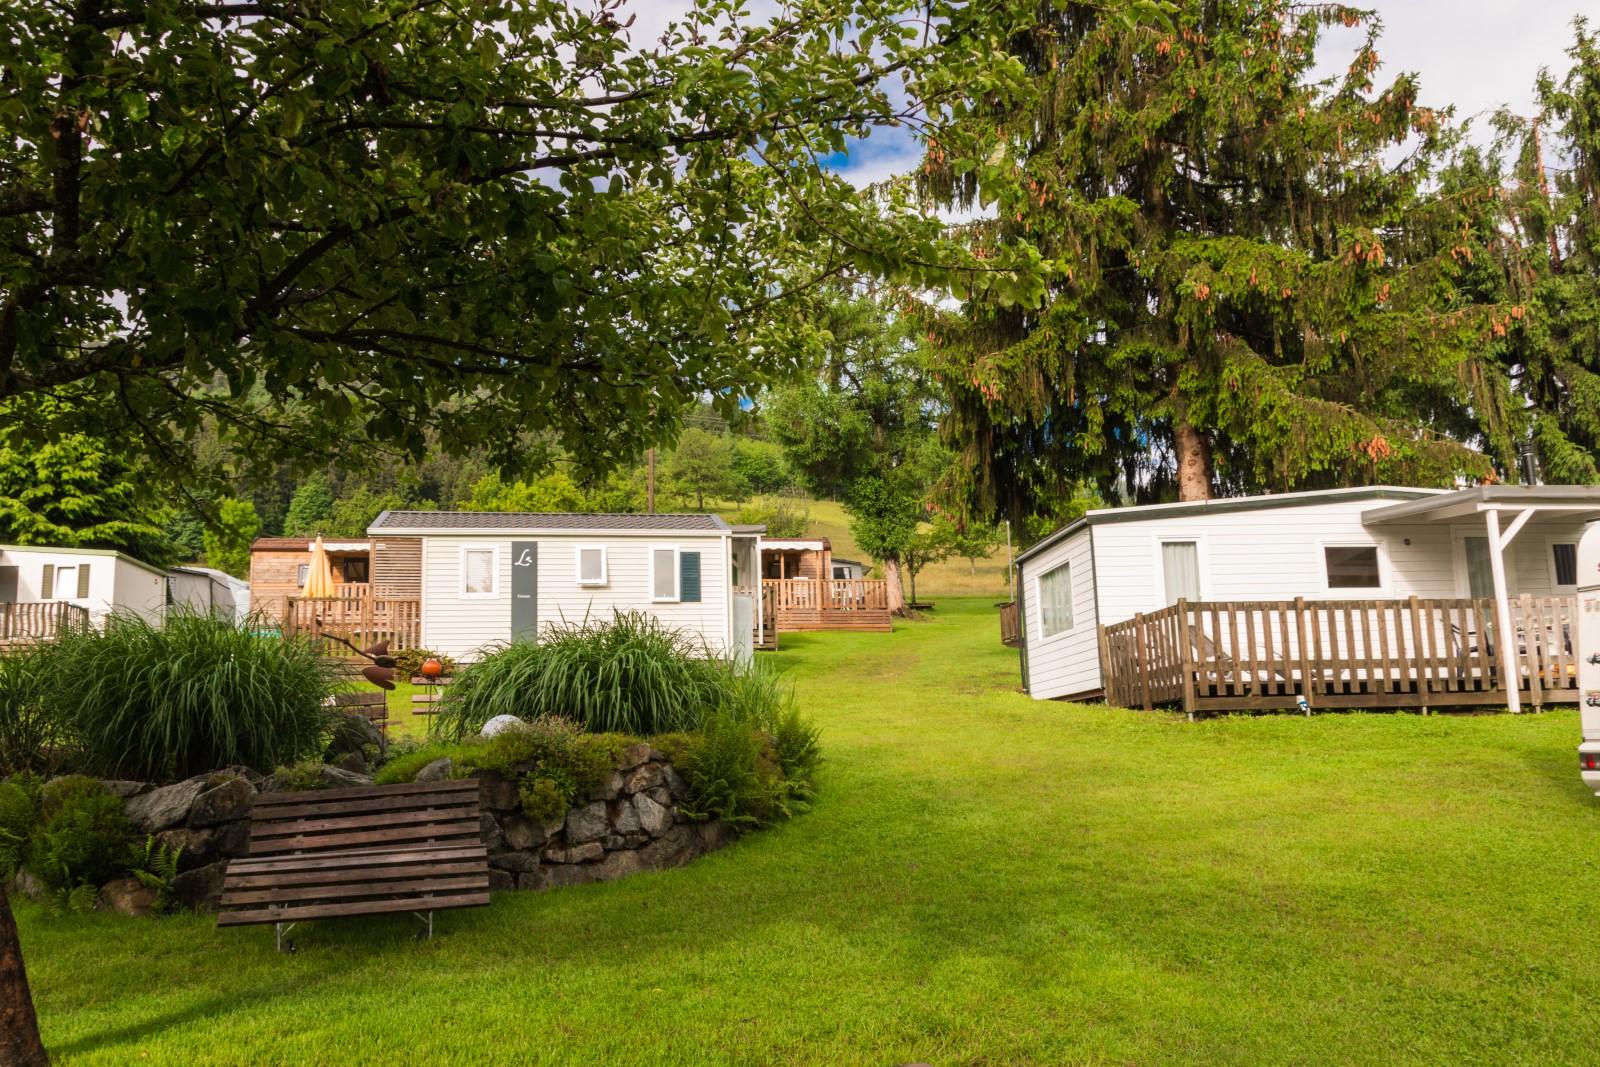 Vista sui bungalow